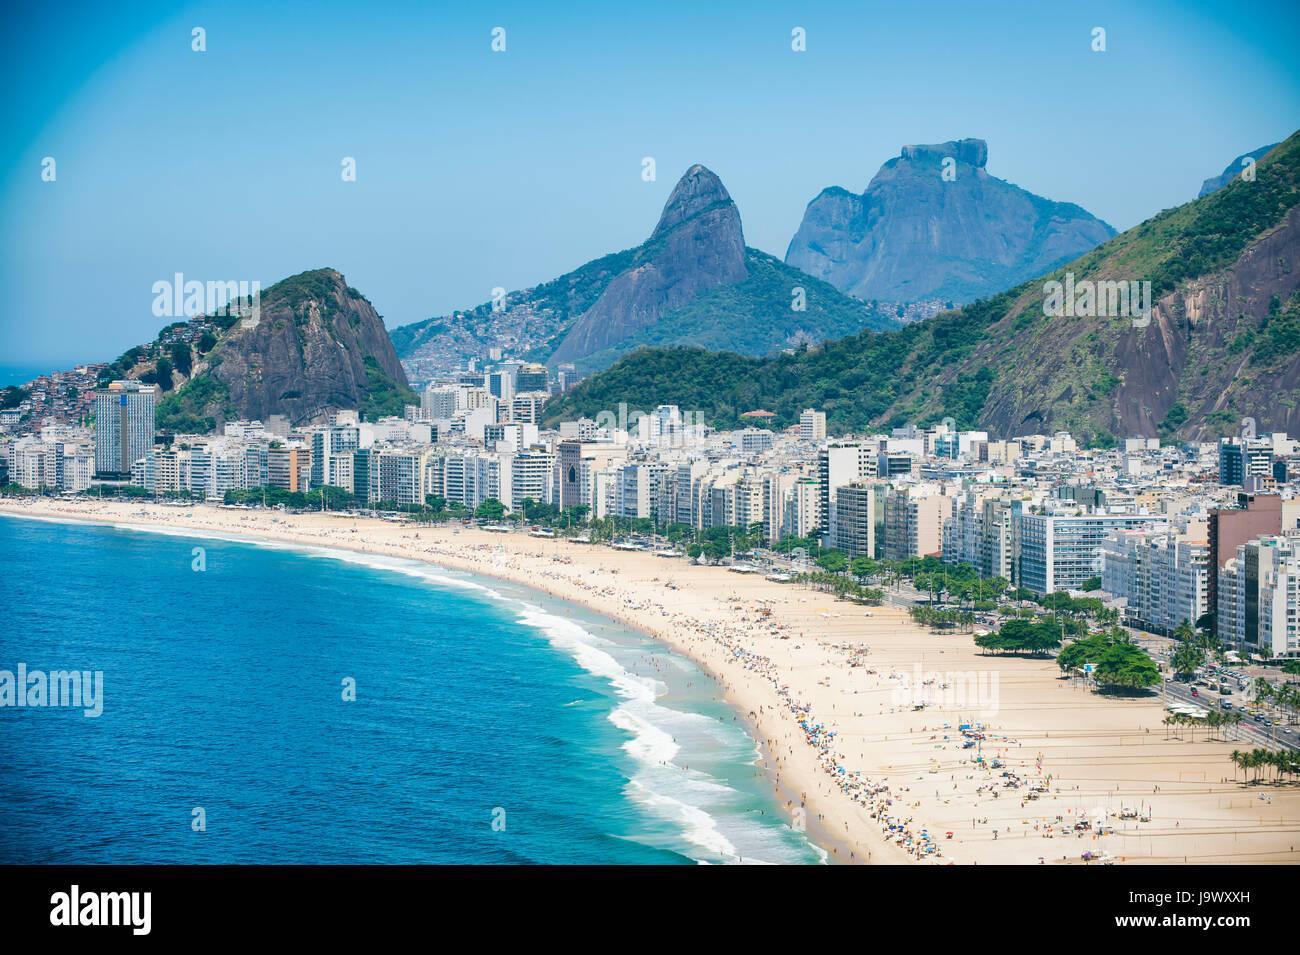 Bright scenic view of the Rio de Janeiro, Brazil skyline overlooking the shore of Copacabana Beach and dramatic - Stock Image